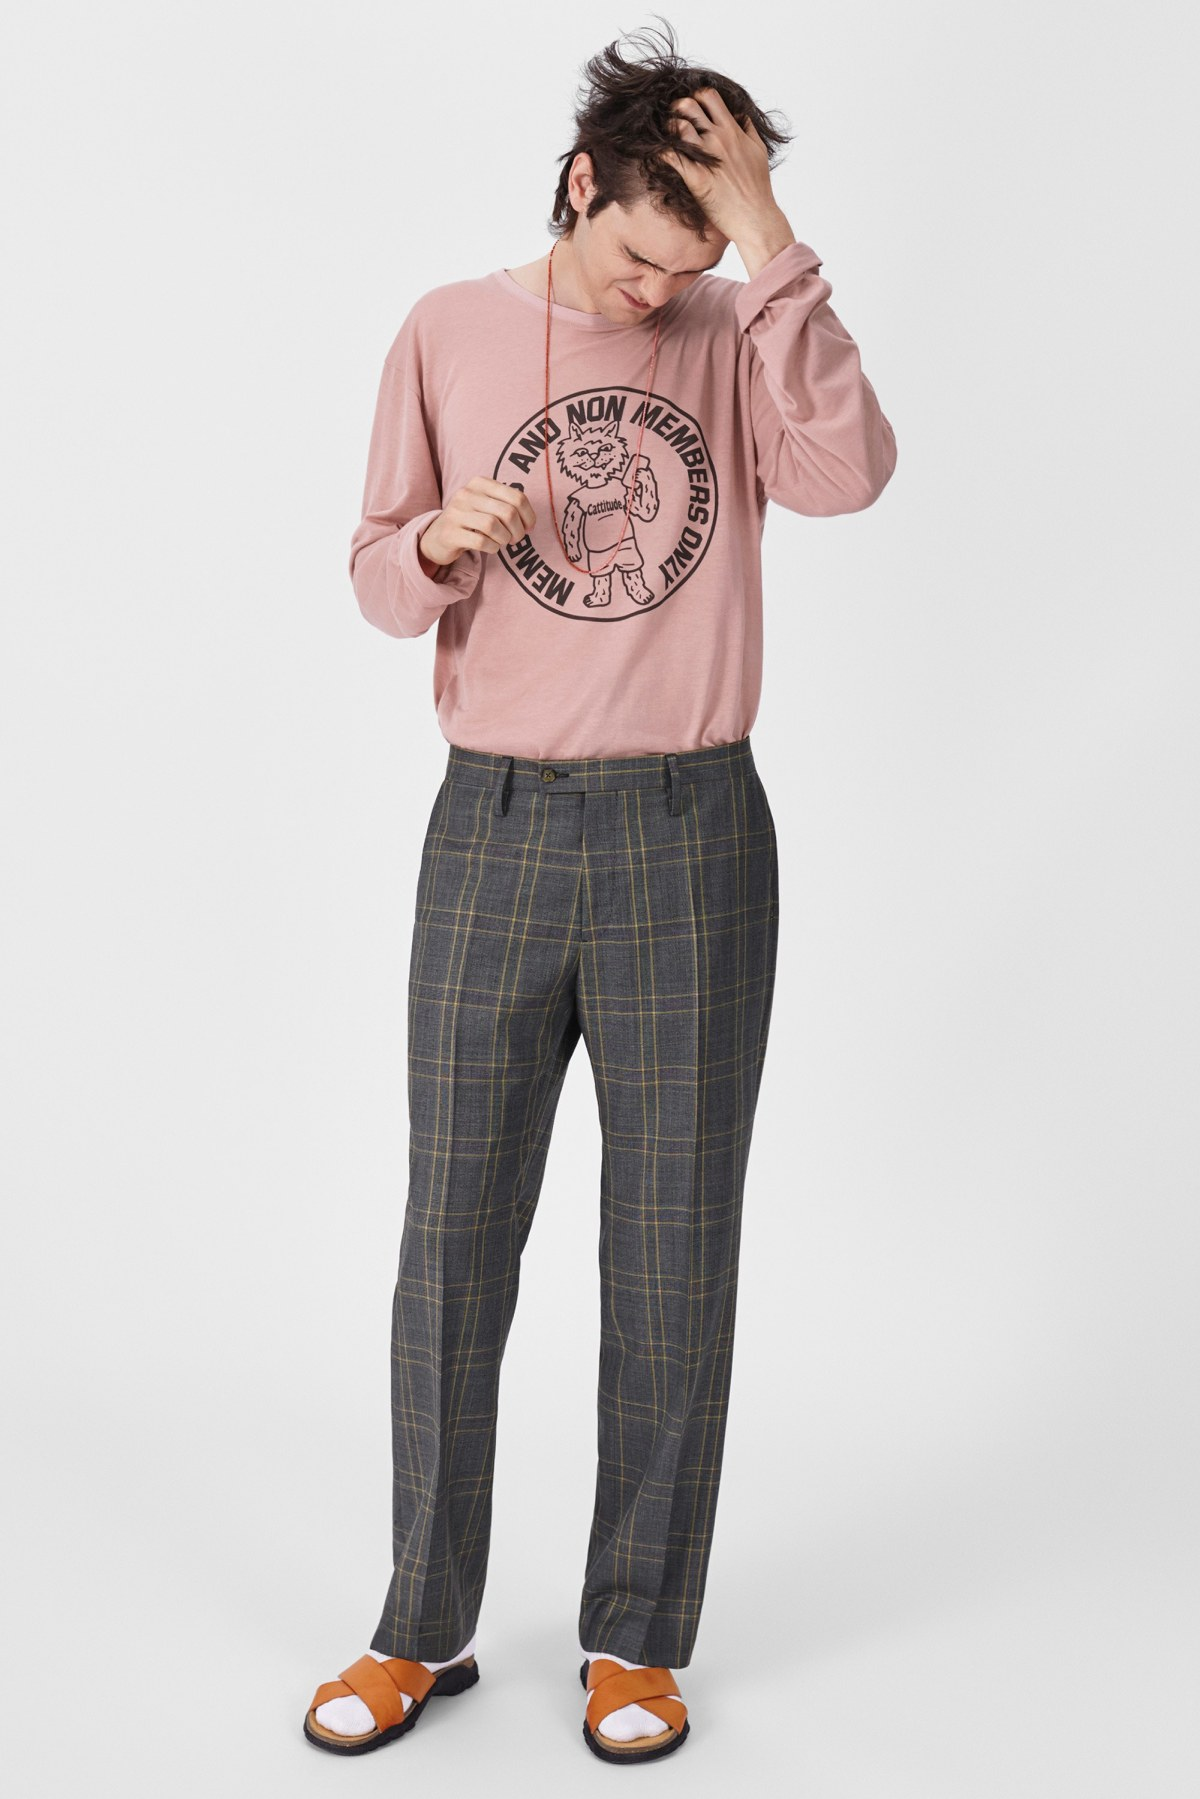 stella-mccartney-spring-2017-mens-fashion-show-the-impression-18